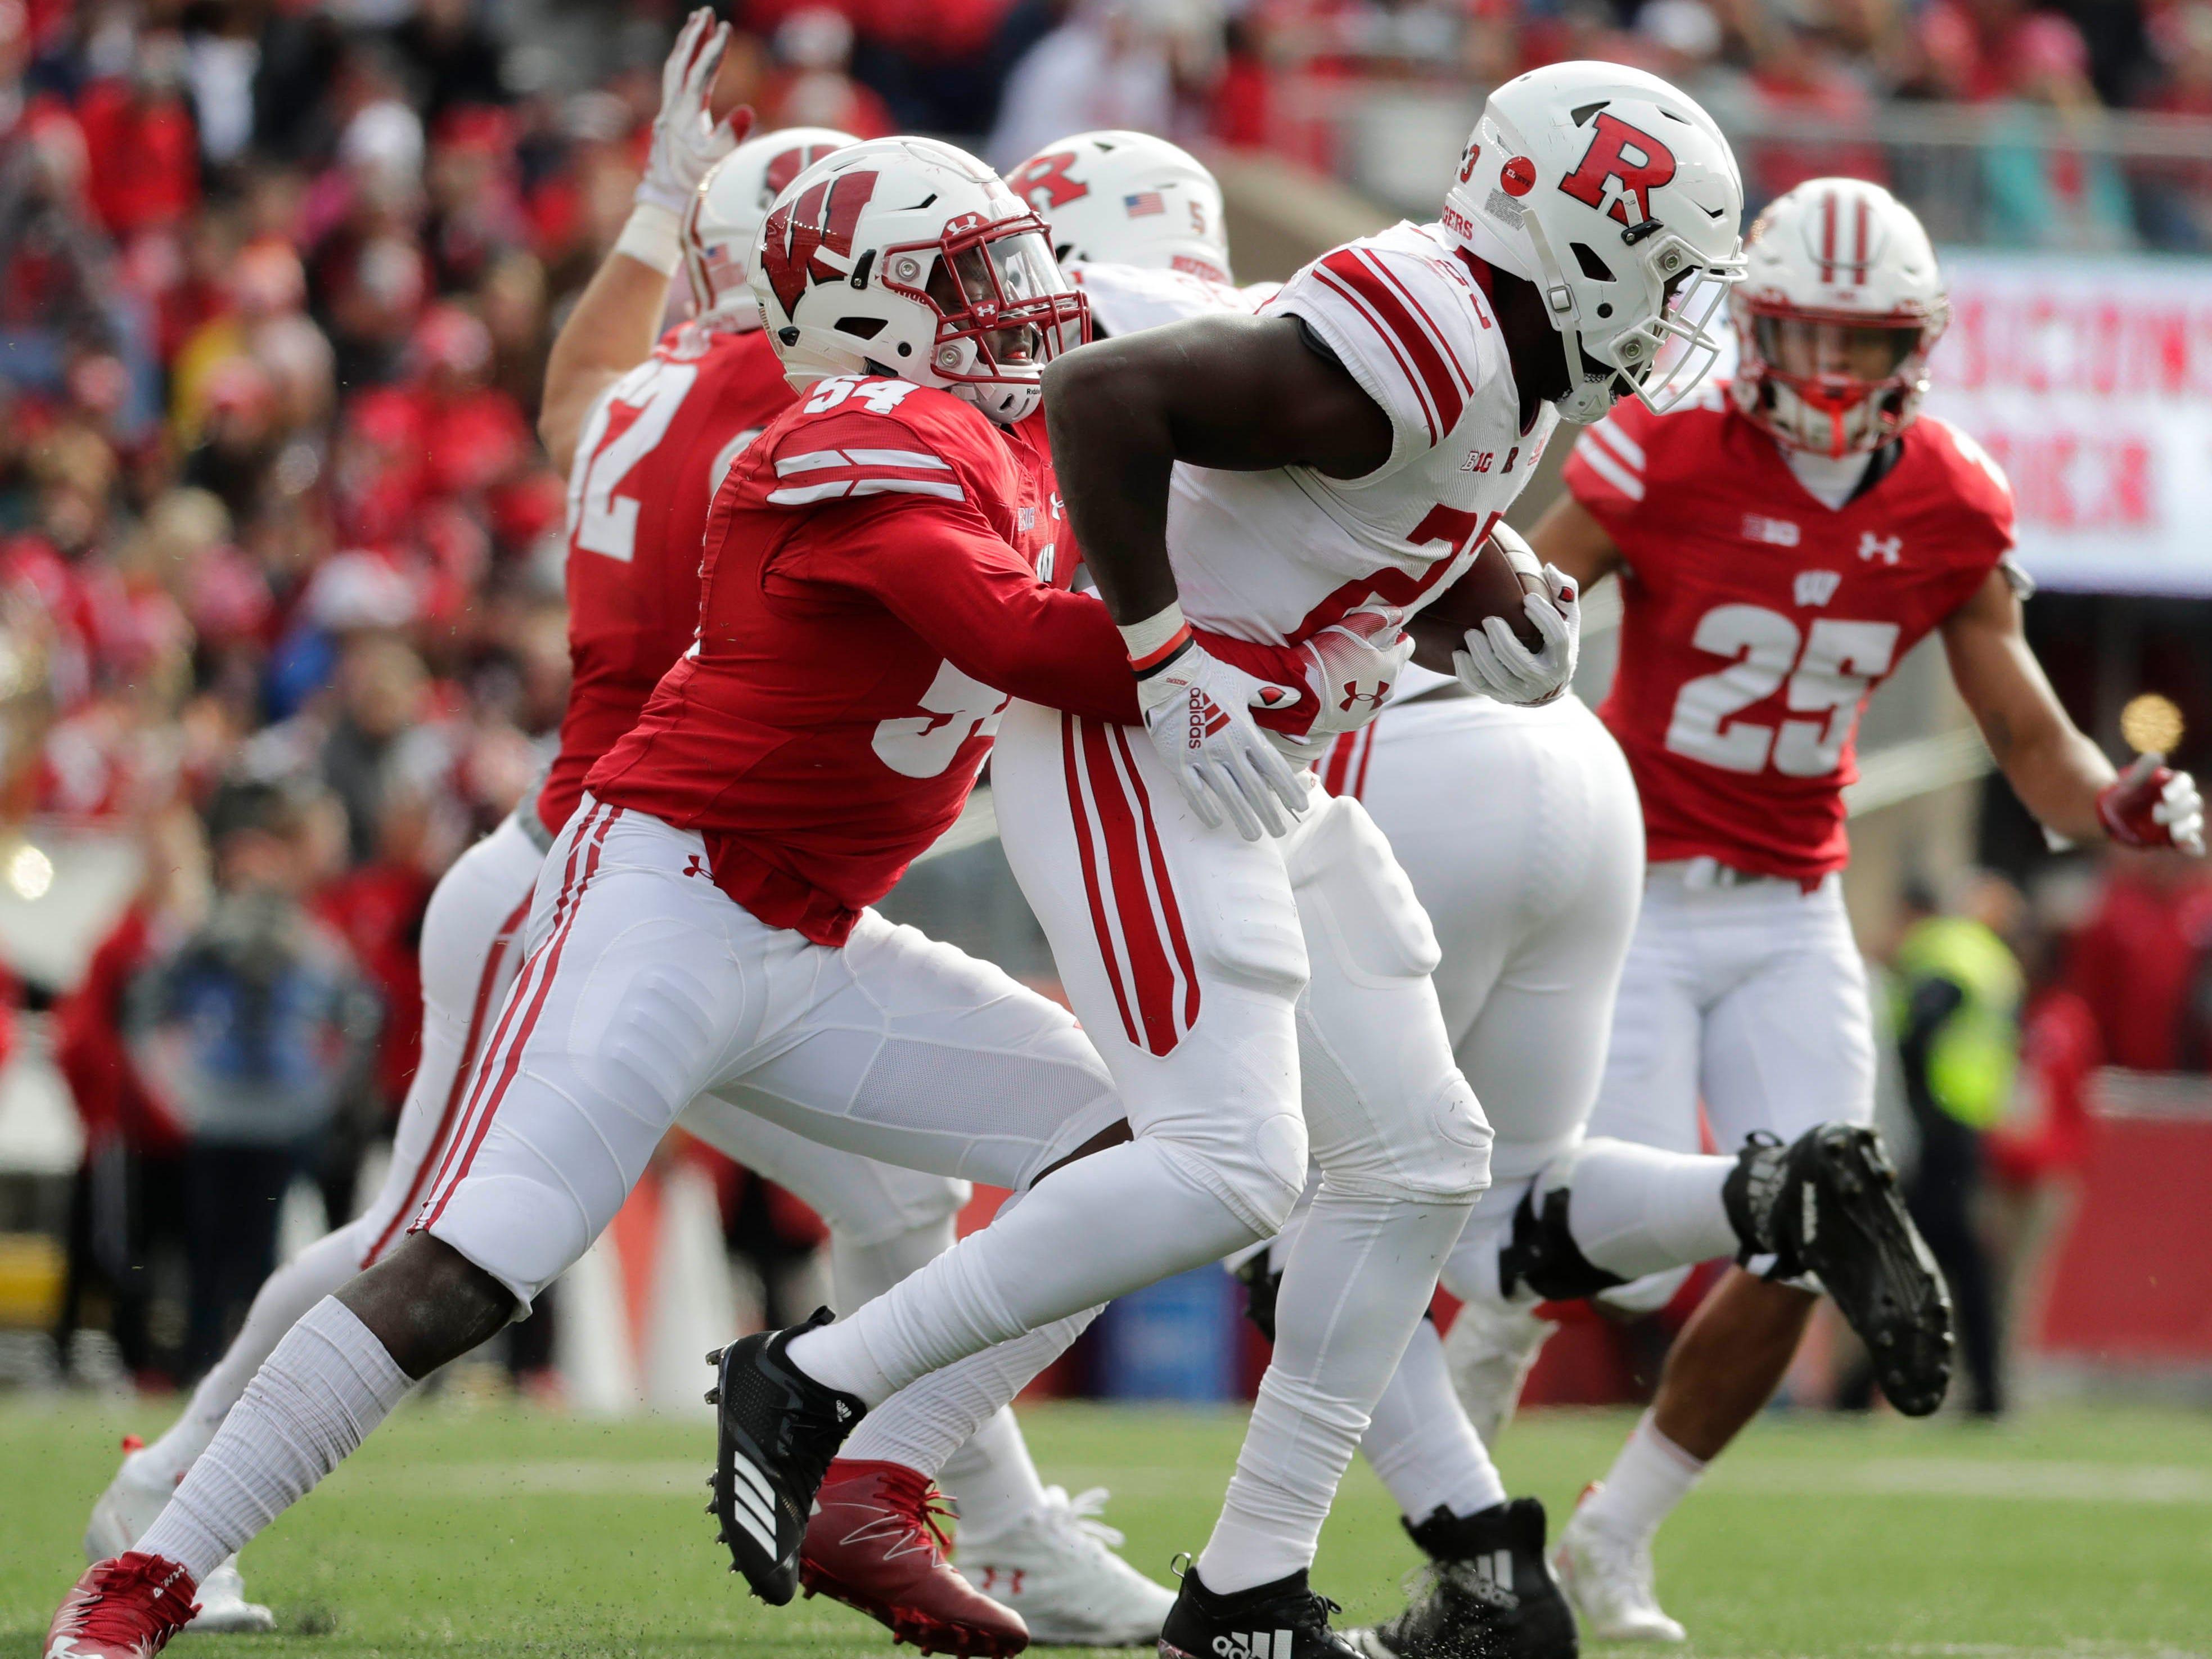 Badgers inside linebacker Chris Orr wraps up Rutgers running back Jonathan Hilliman on Saturday.